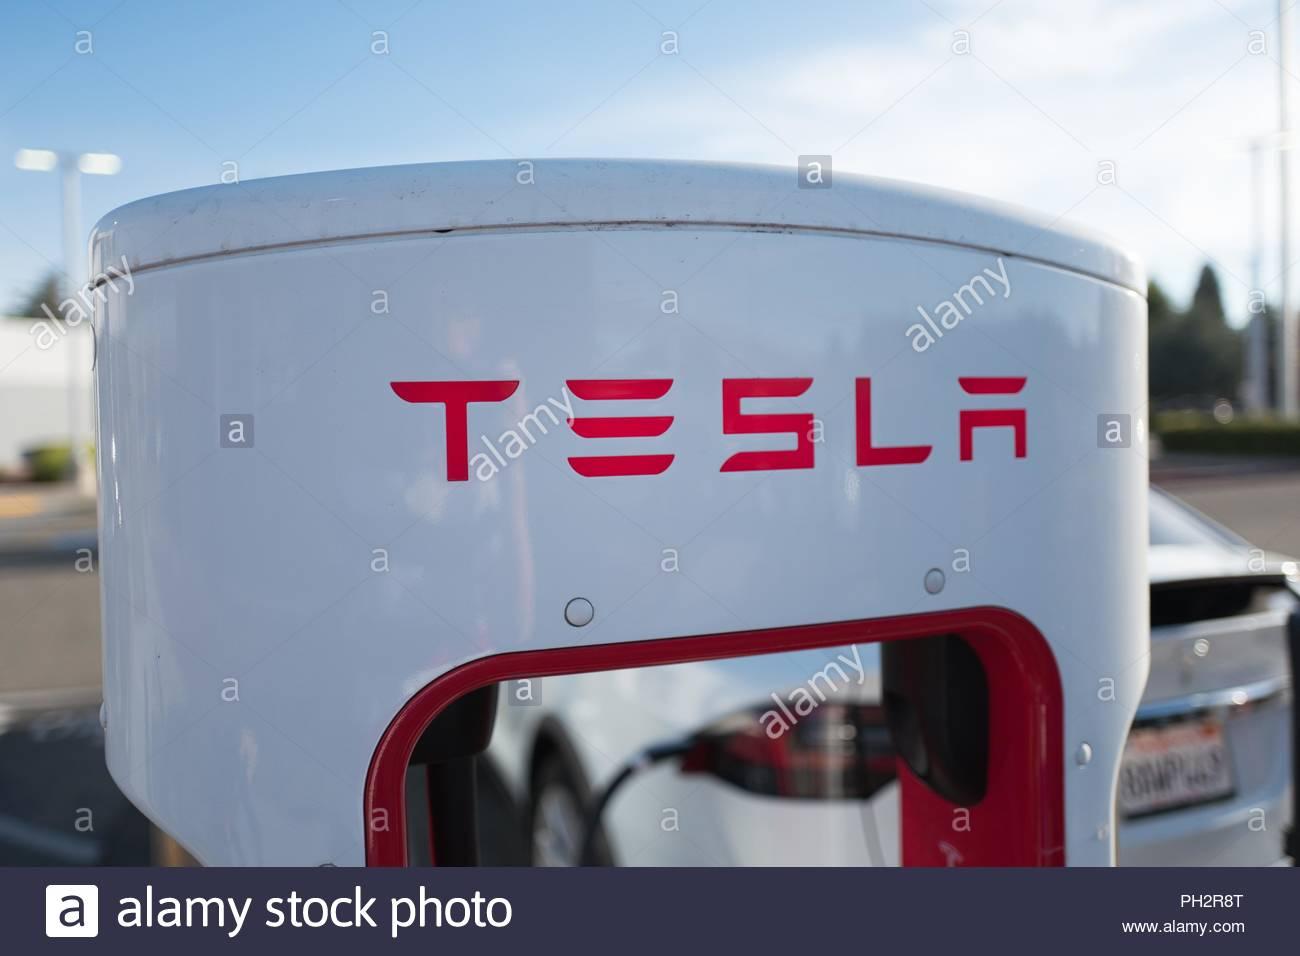 Close up of Tesla Motors logo on Supercharger electric vehicle 1300x956